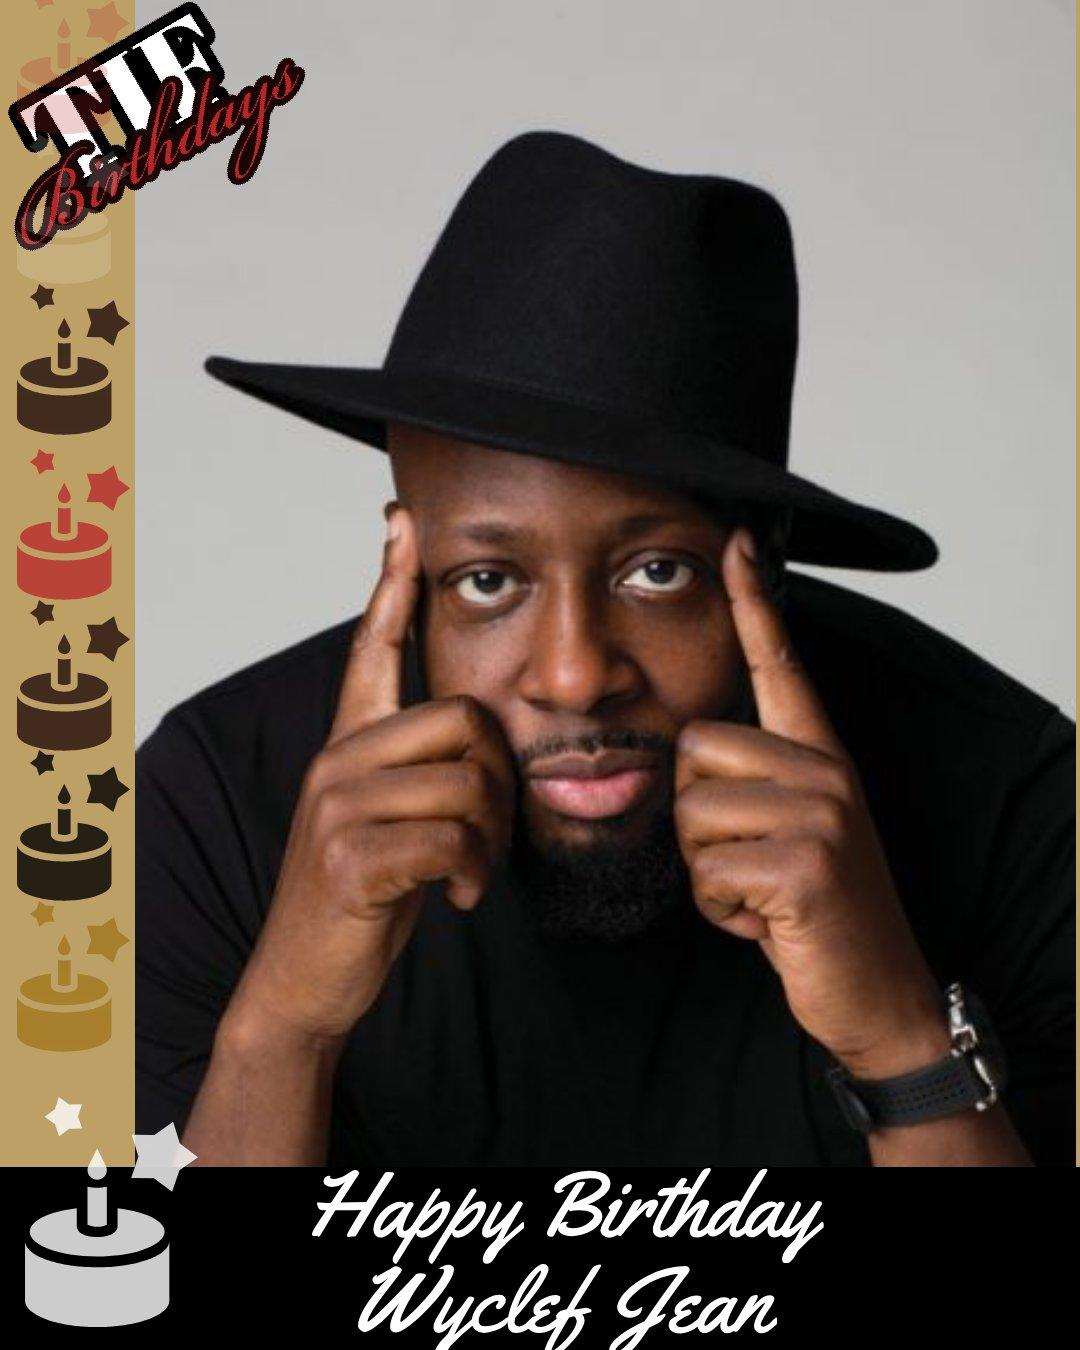 Happy Birthday to the amazingly talented Wyclef Jean